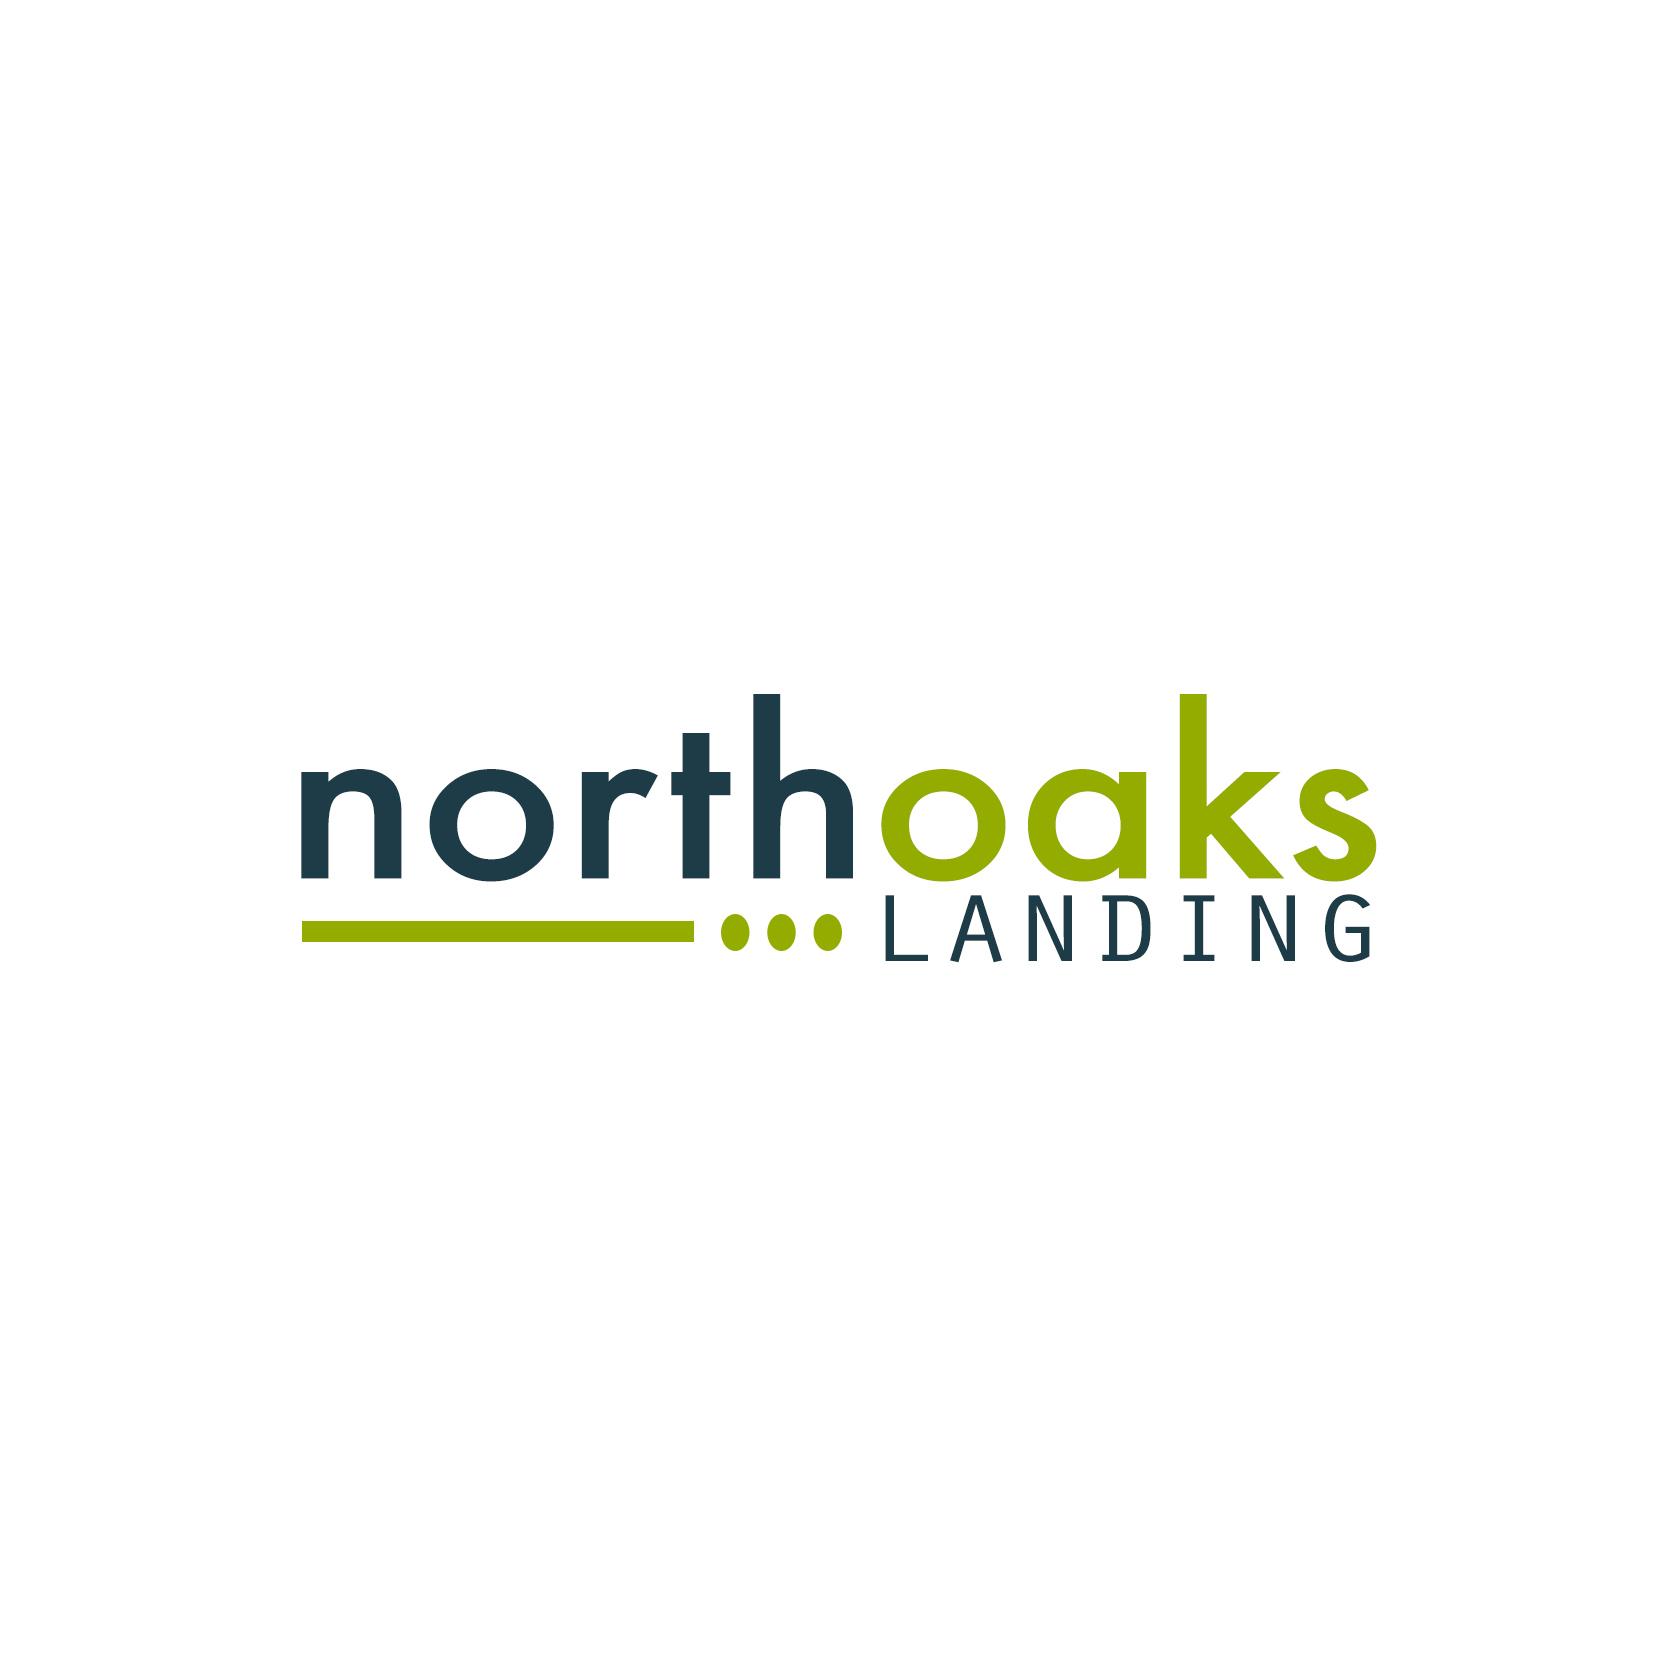 North Oaks Landing